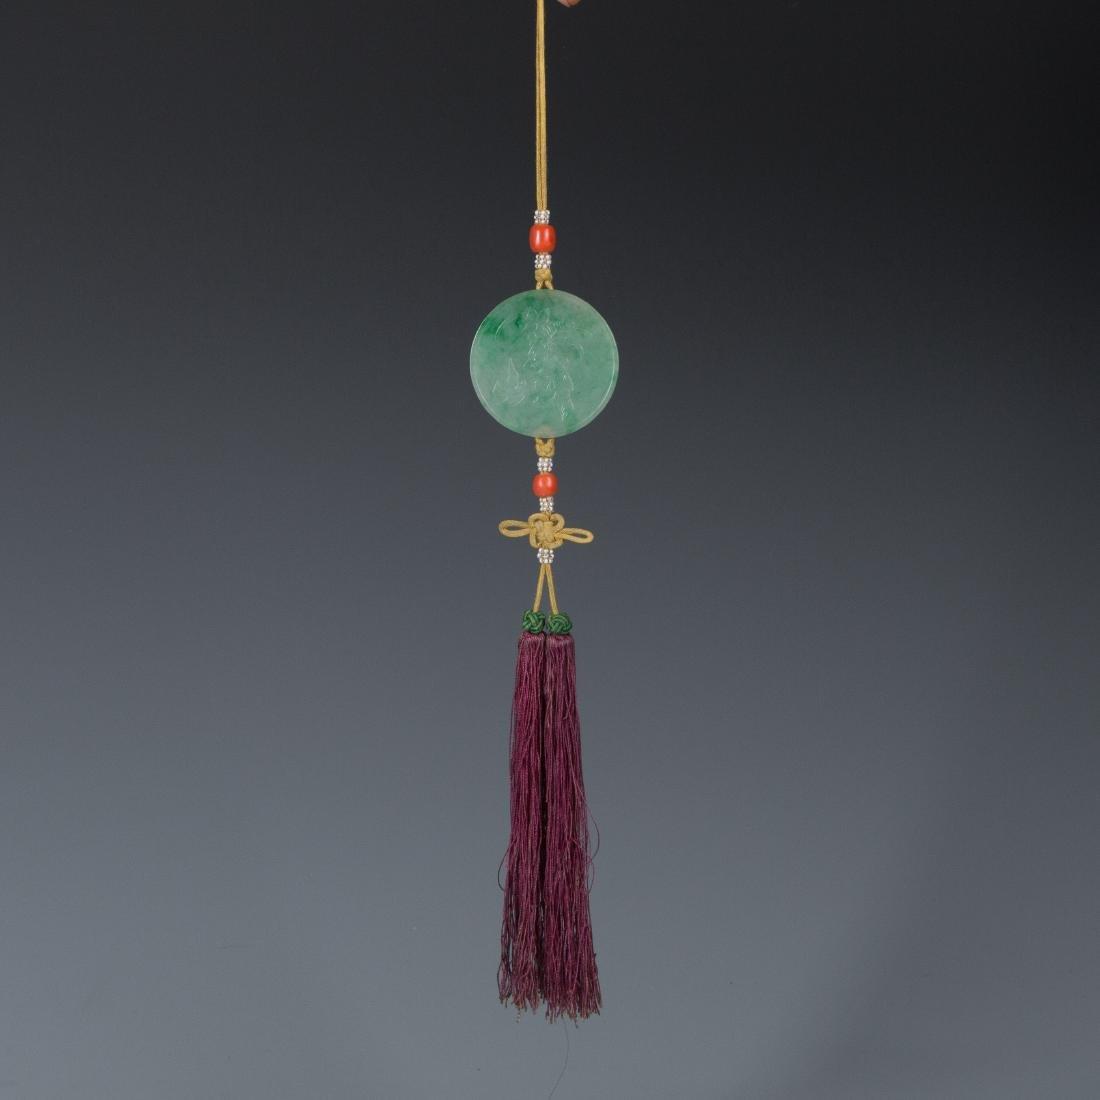 Jadeite disk on lanyard with tassel